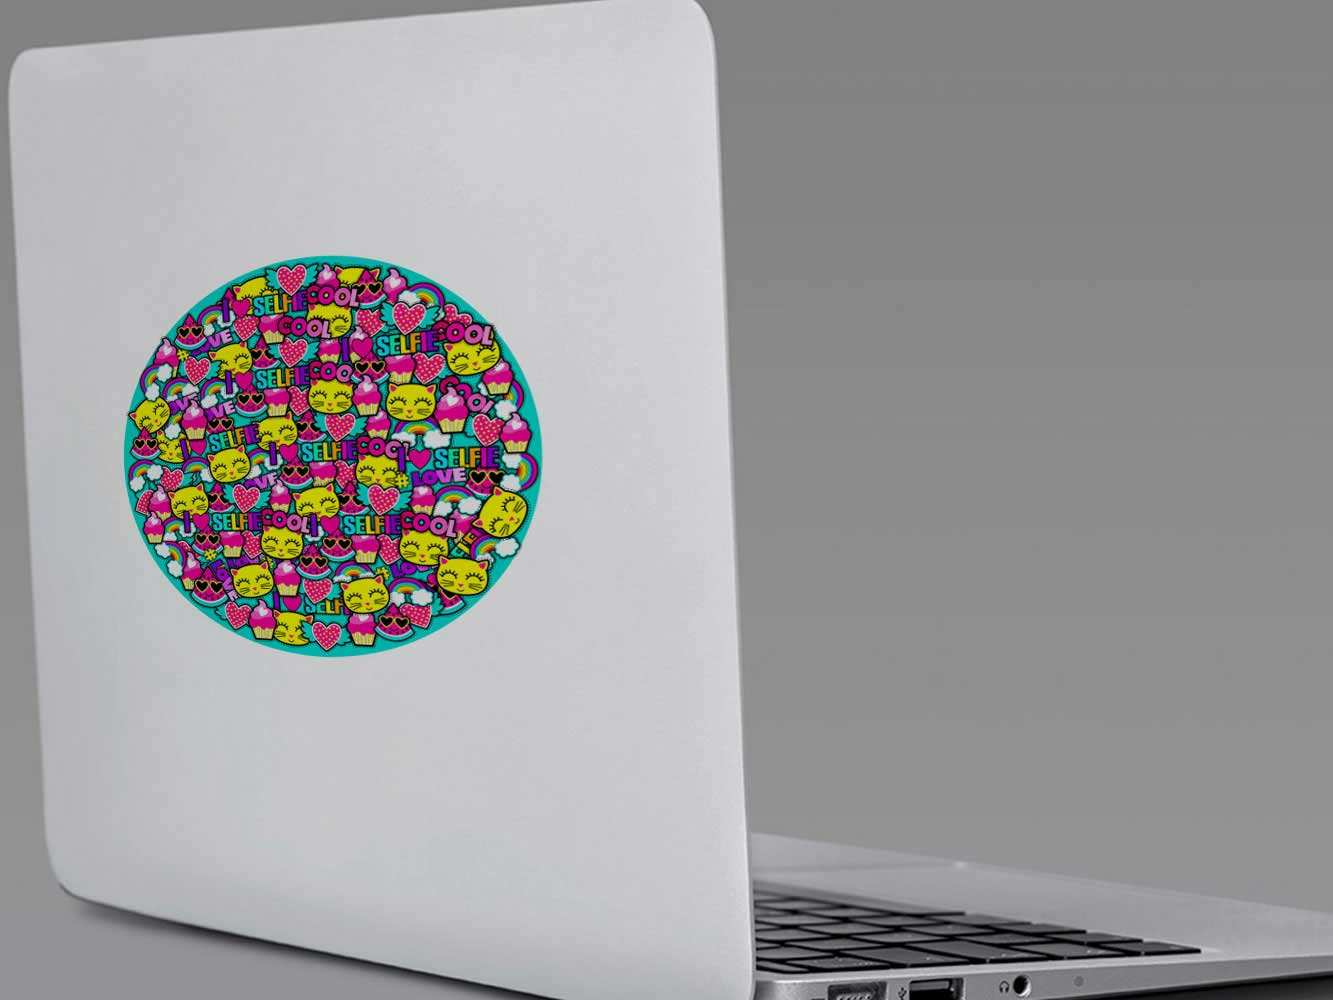 Vinilo Adhesivo Círculo de Colores   Carteles XXL - Impresión carteleria publicitaria